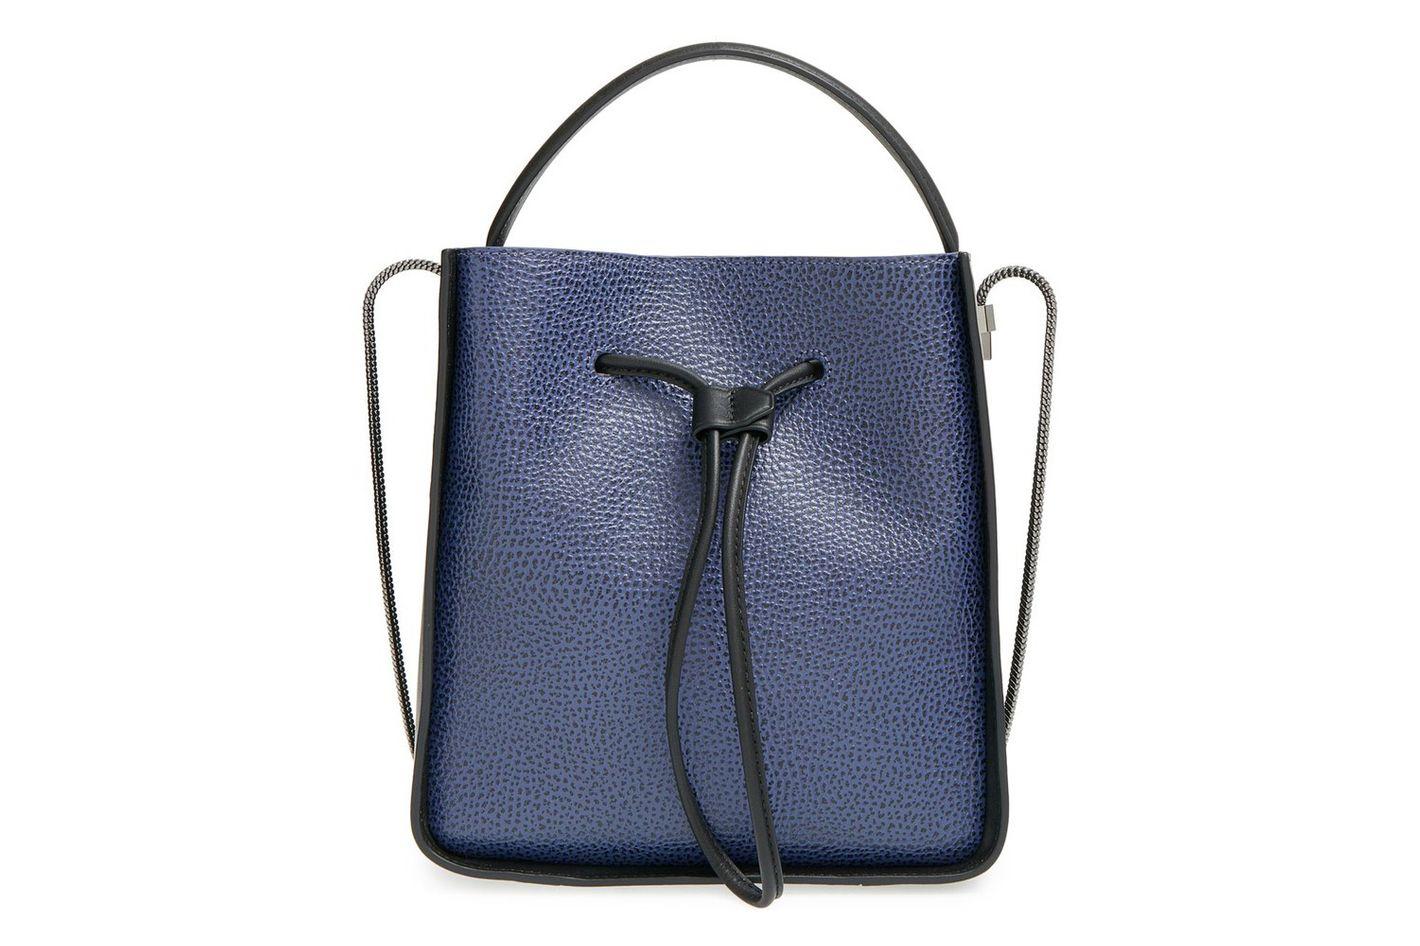 3.1 Phillip Lim Small Soleil Bucket Bag